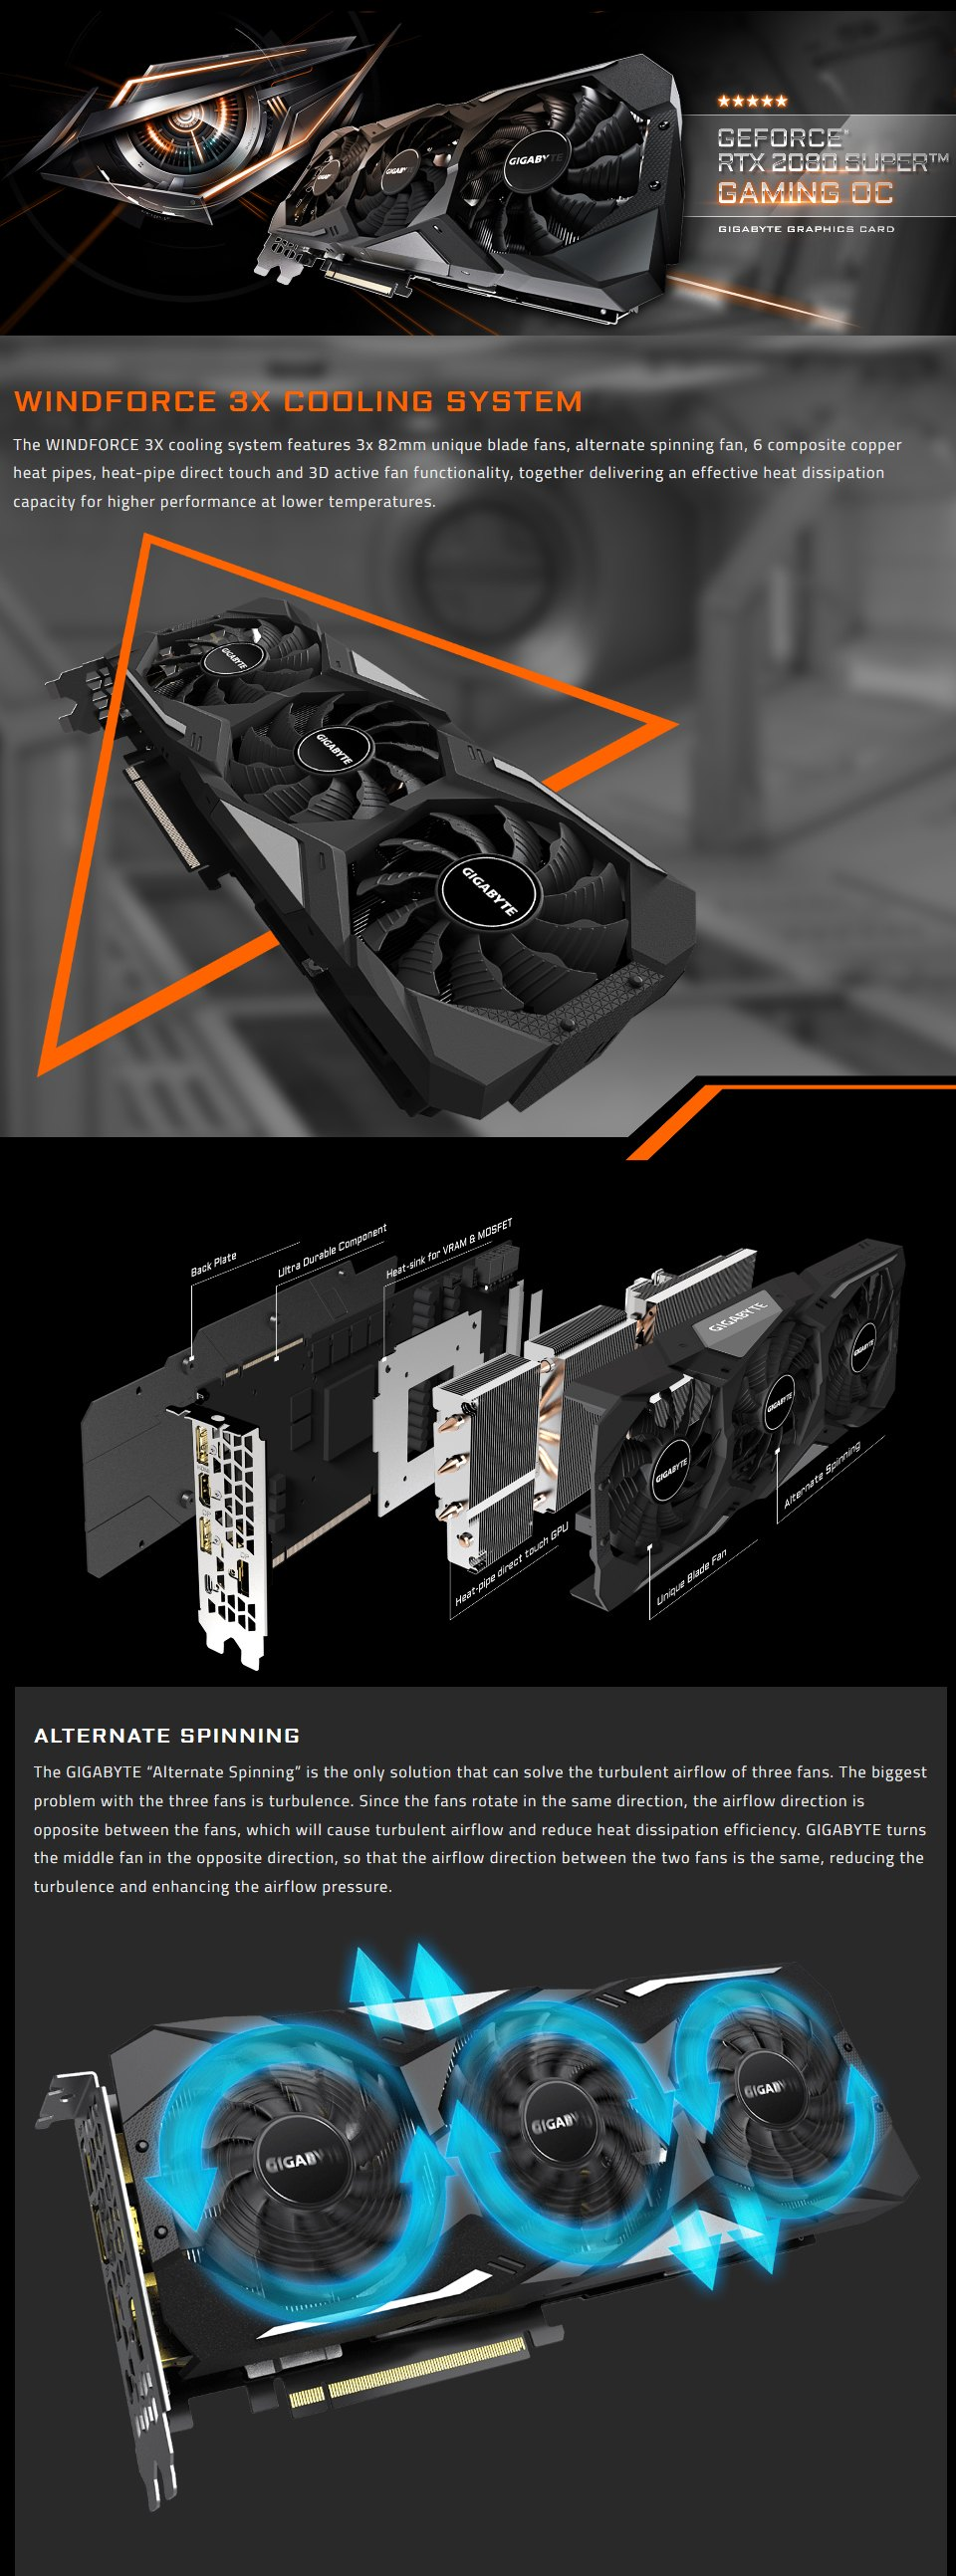 Gigabyte GeForce RTX 2080 Super Gaming OC 8GB Rev 2.0 features